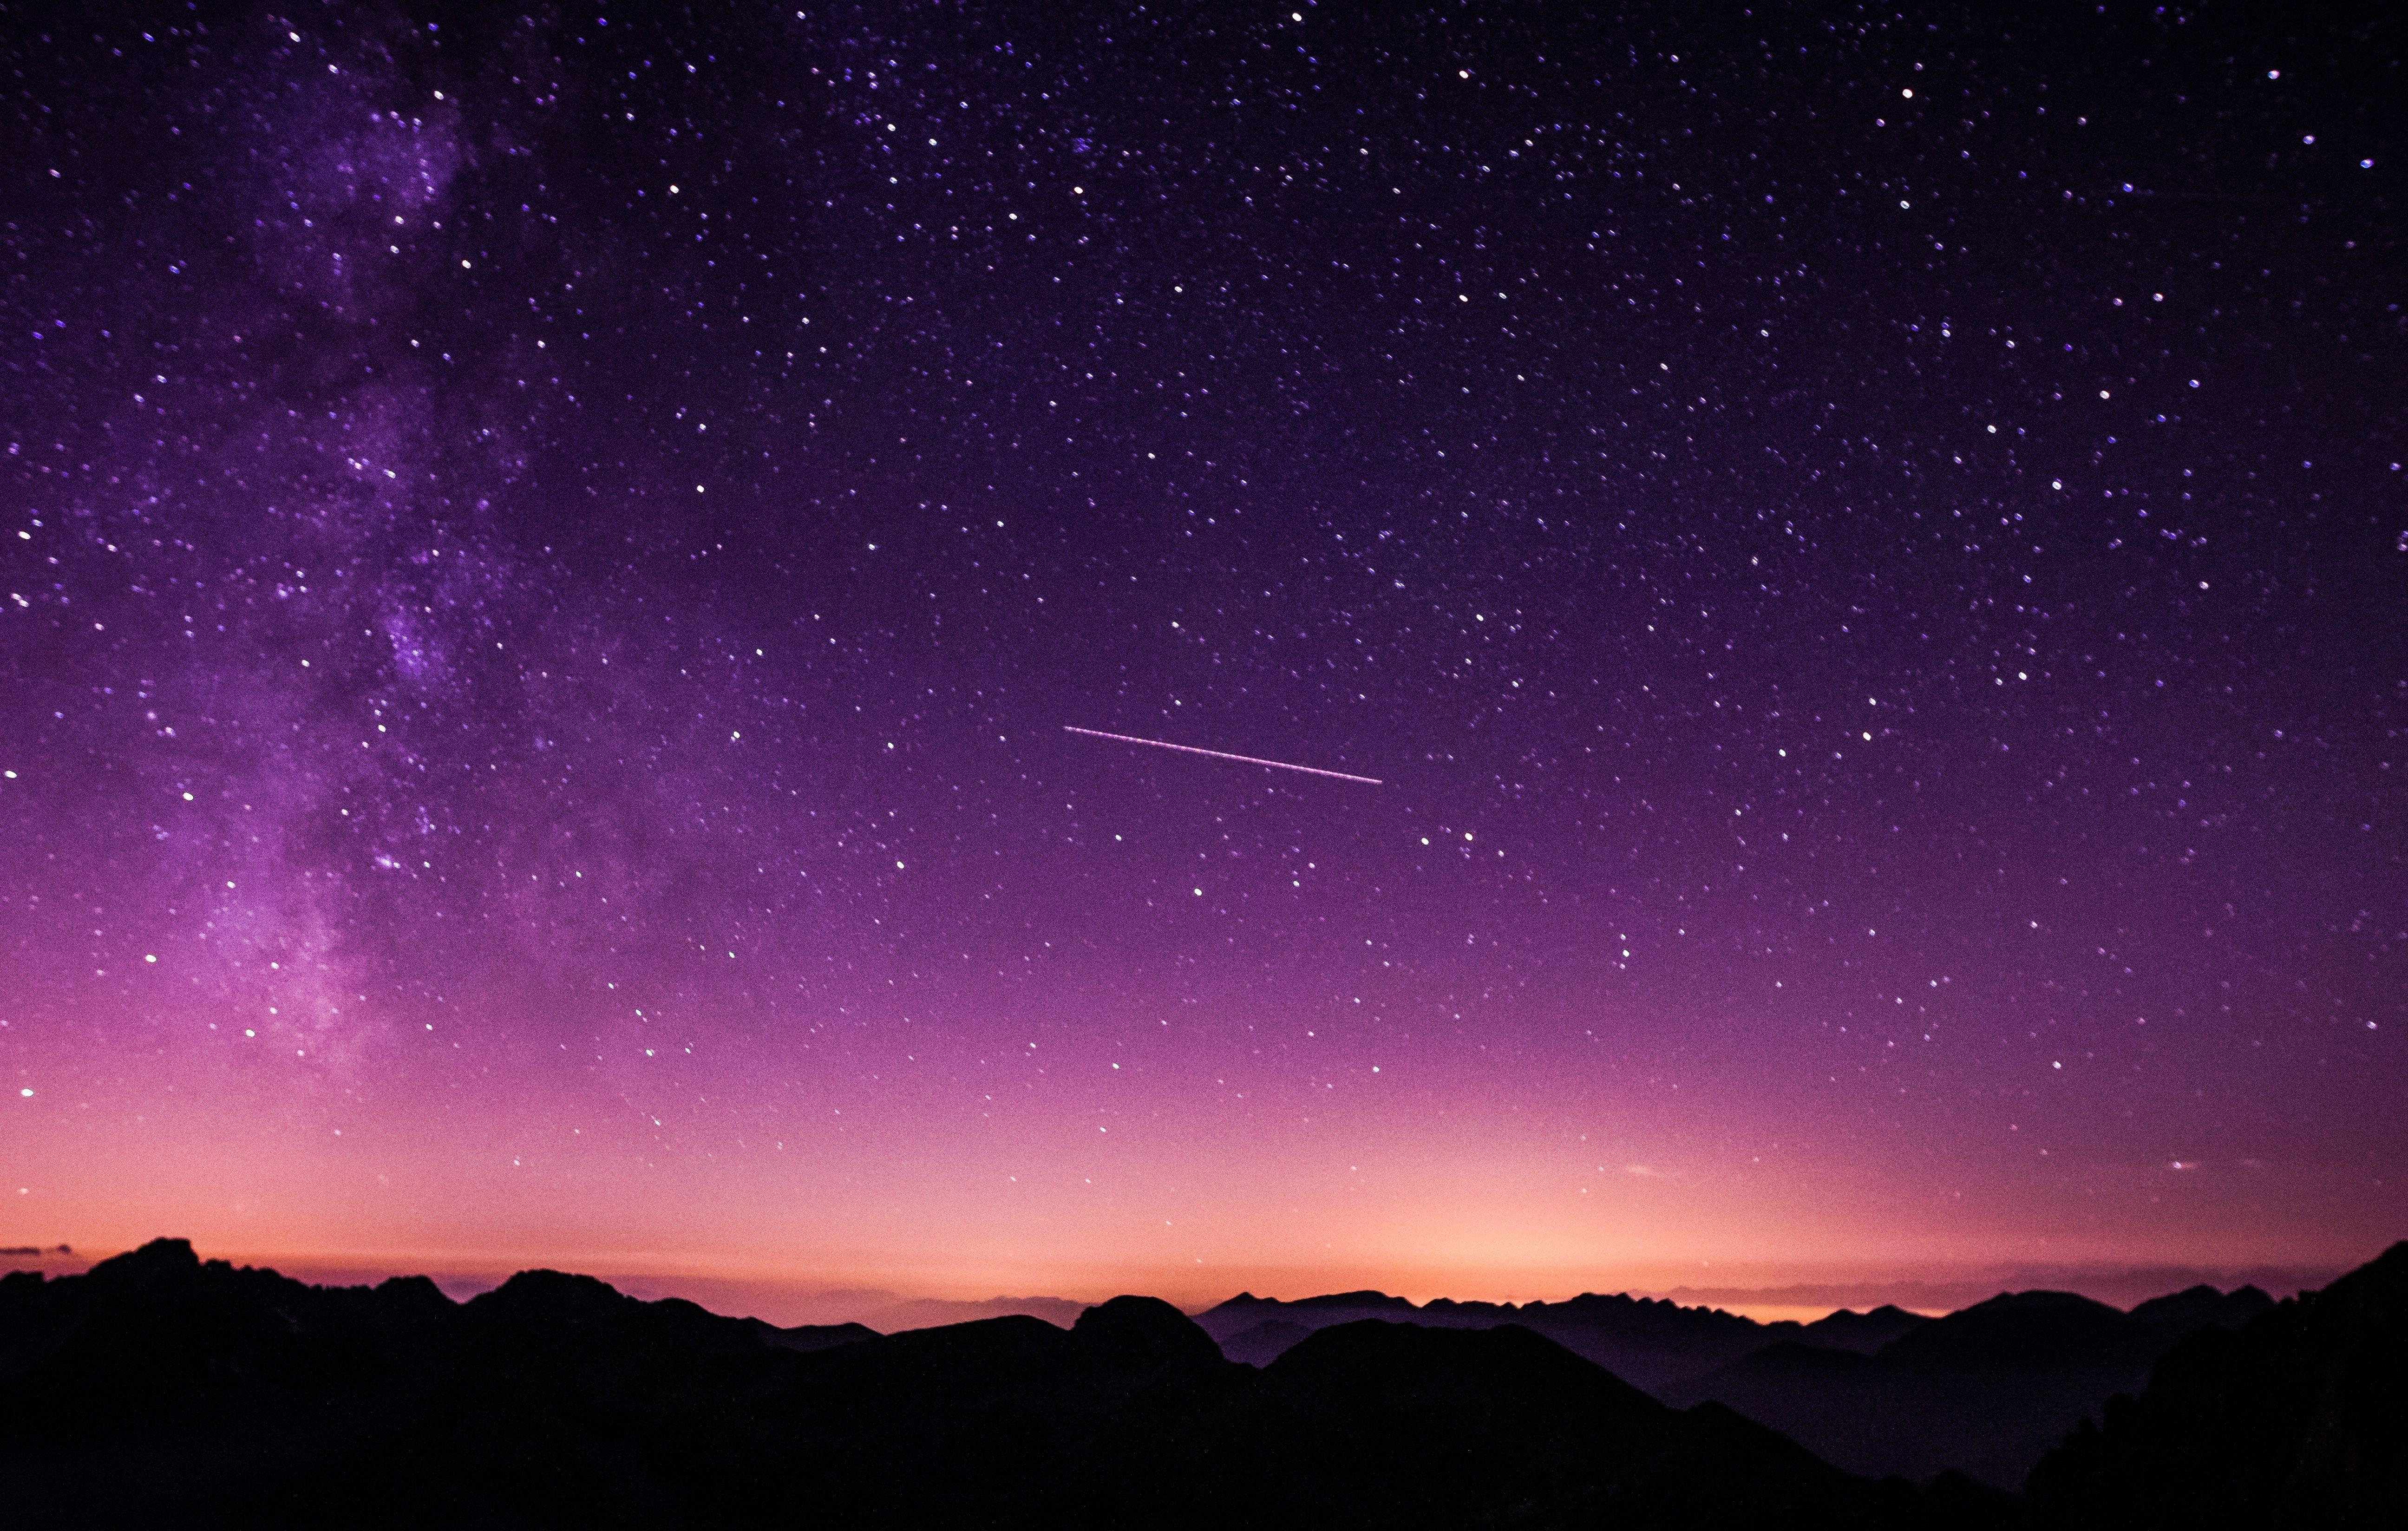 Purple Night Sky Wallpapers Top Free Purple Night Sky Backgrounds Wallpaperaccess